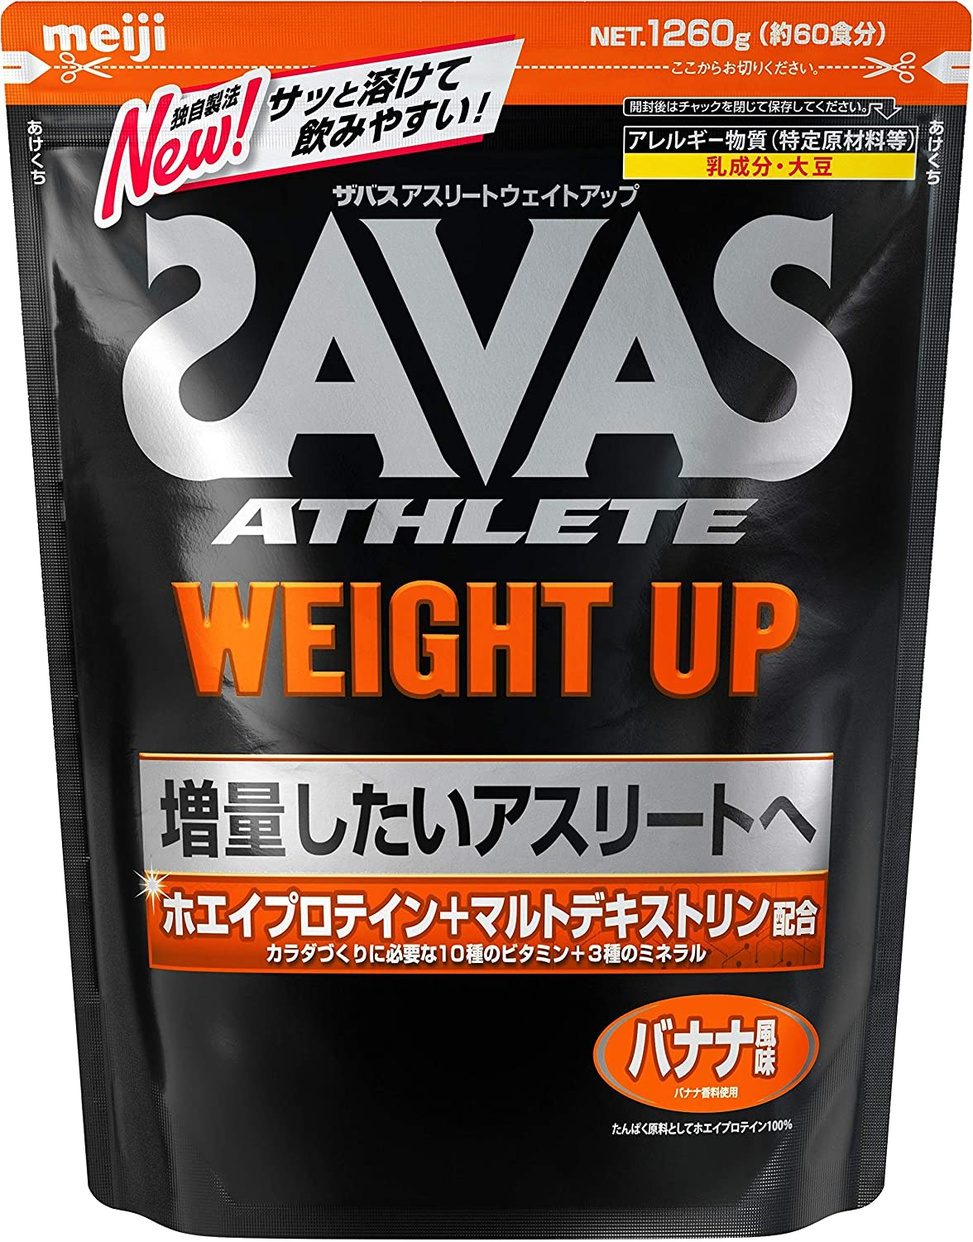 SAVAS(ザバス) アスリート ウエイト アップの商品画像